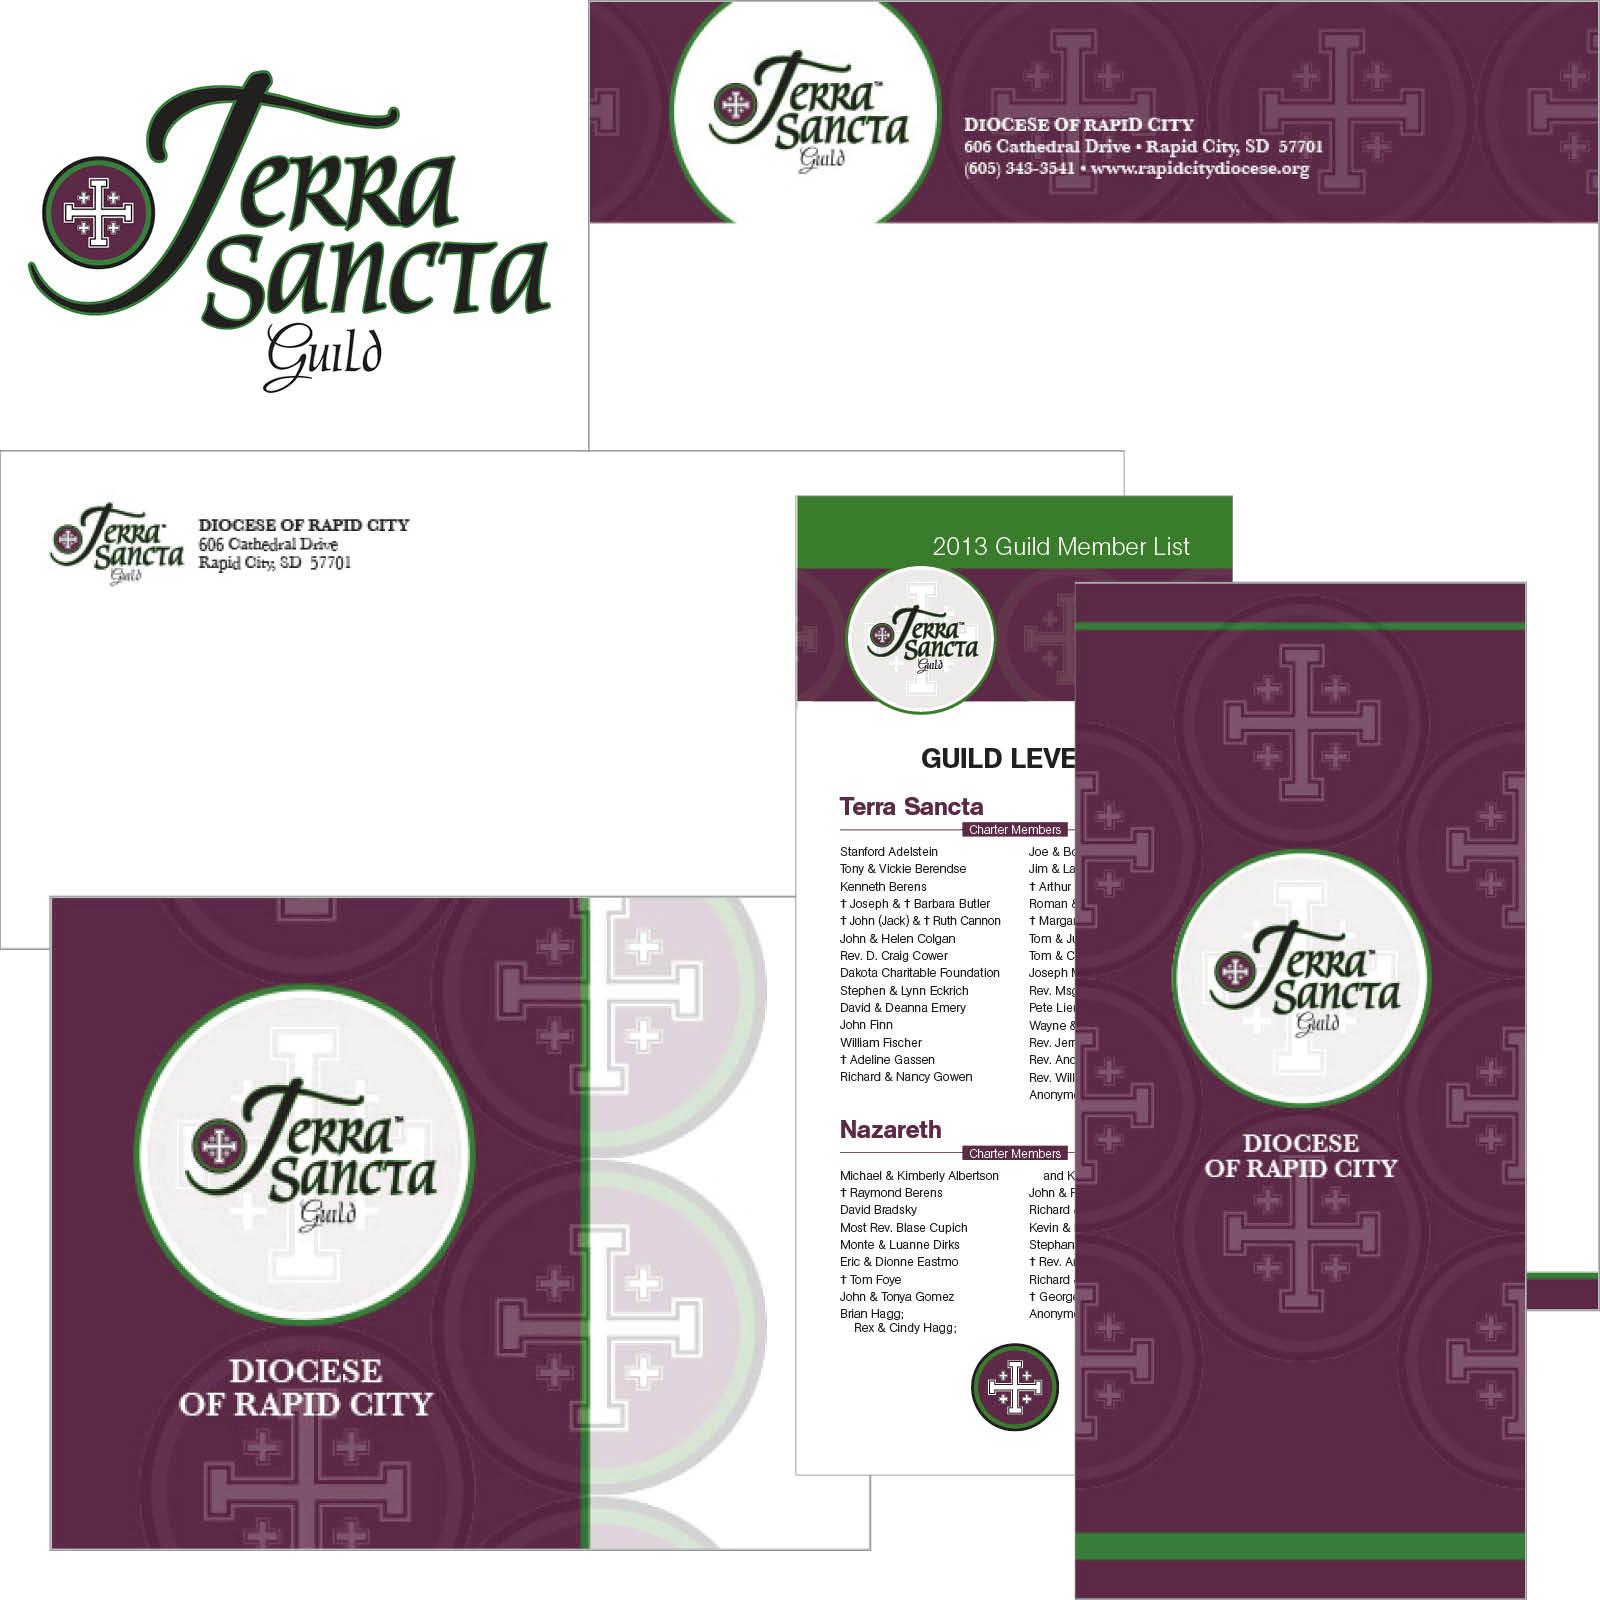 Terra Sancta Guild